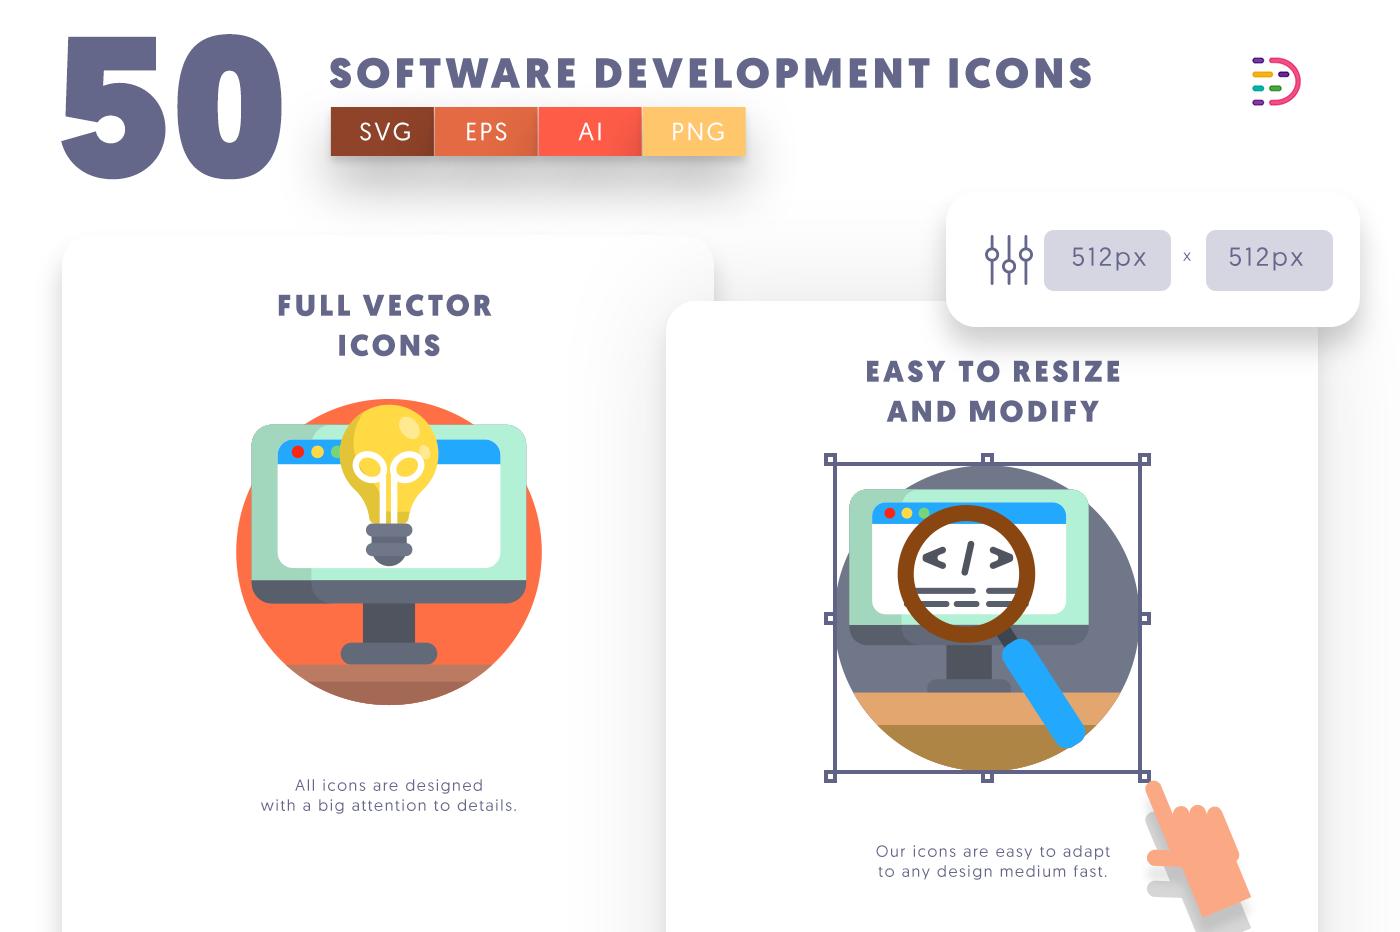 Full vector 50SoftwareDevelopment Icons